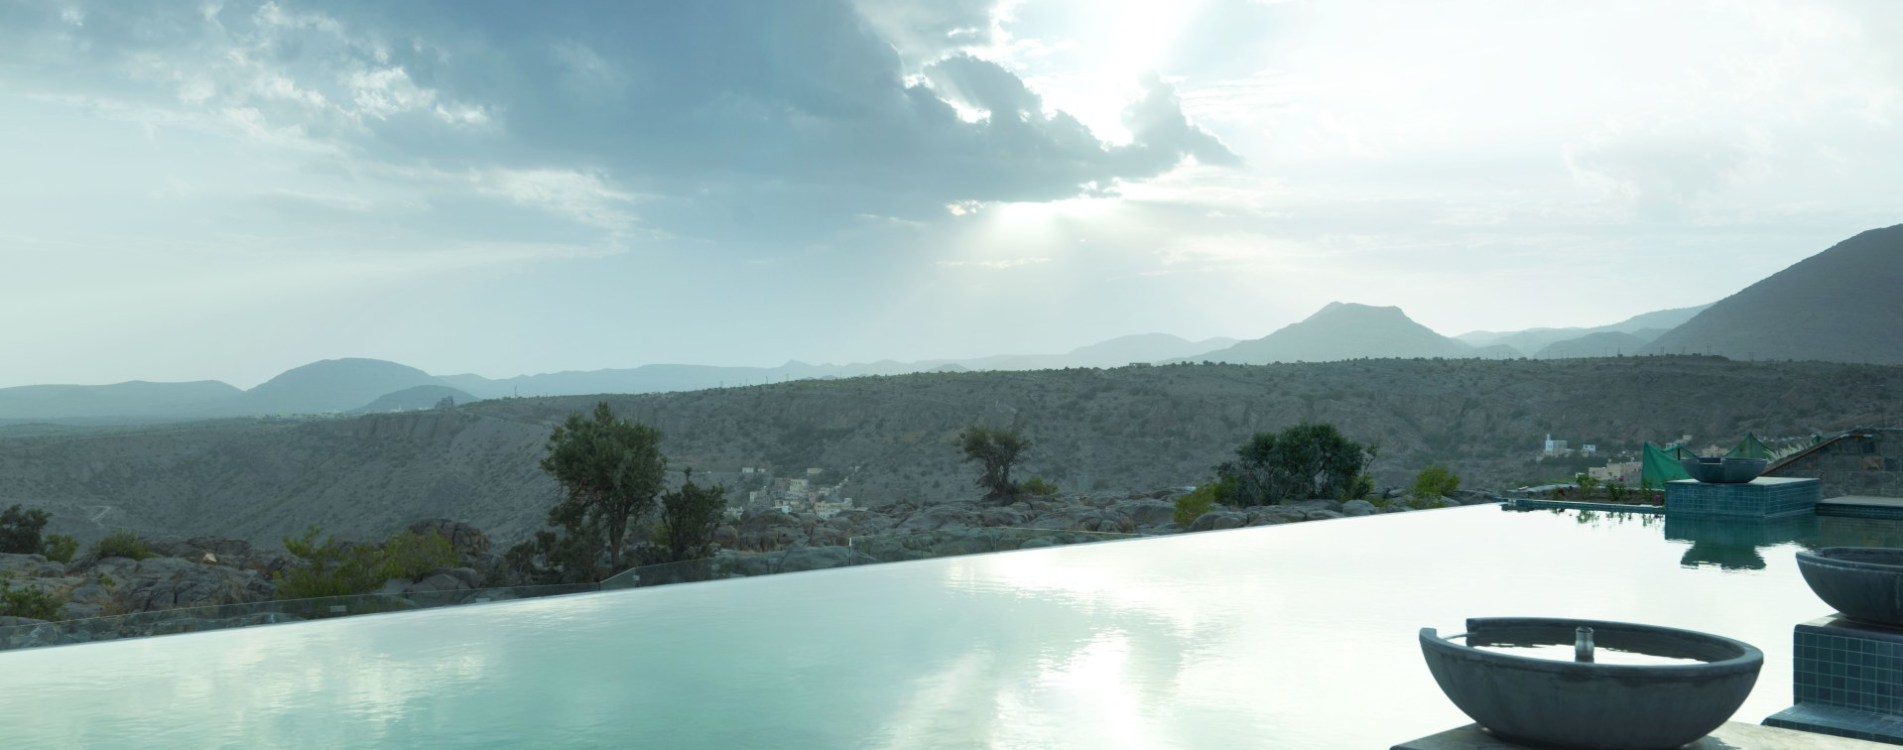 Anantara-Al-Jabal-Al-Akhdar-Resort-Infinity-Pool-Ausblick-Oman.jpg